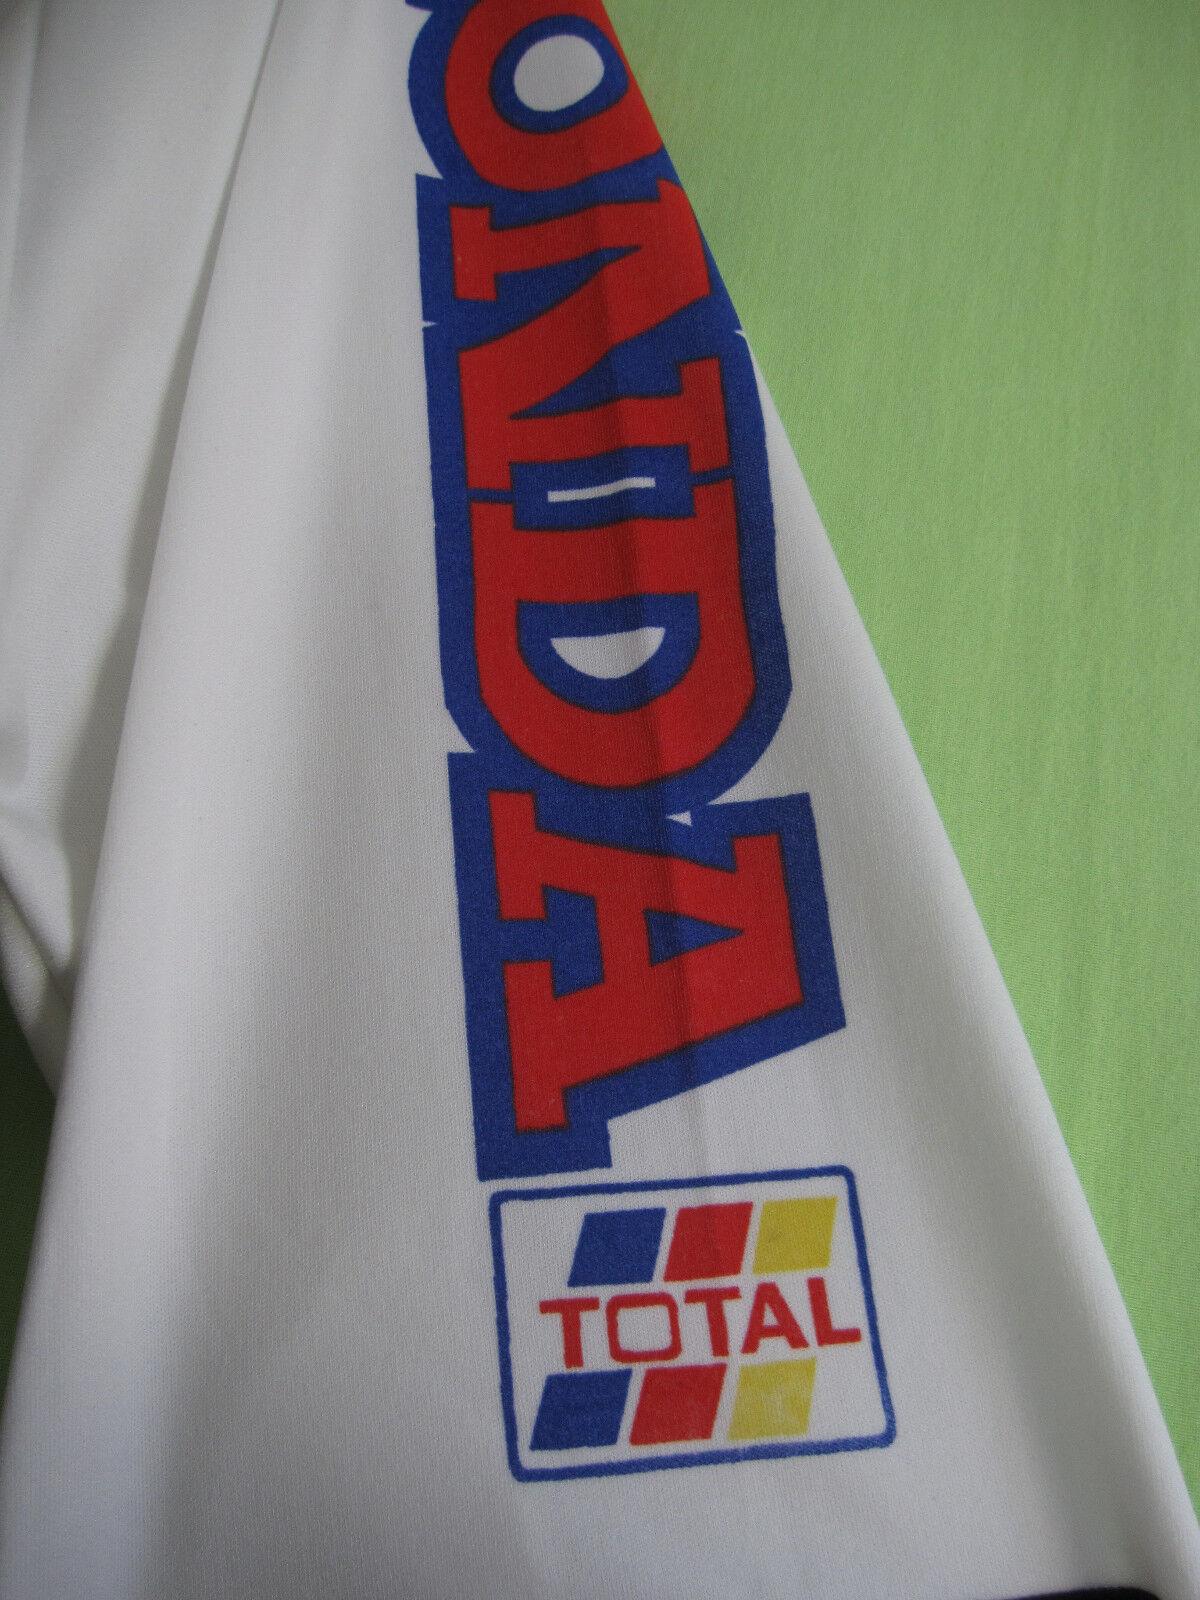 Maillot motocross honda kiwi hrc moto racing cross vintage jersey - s